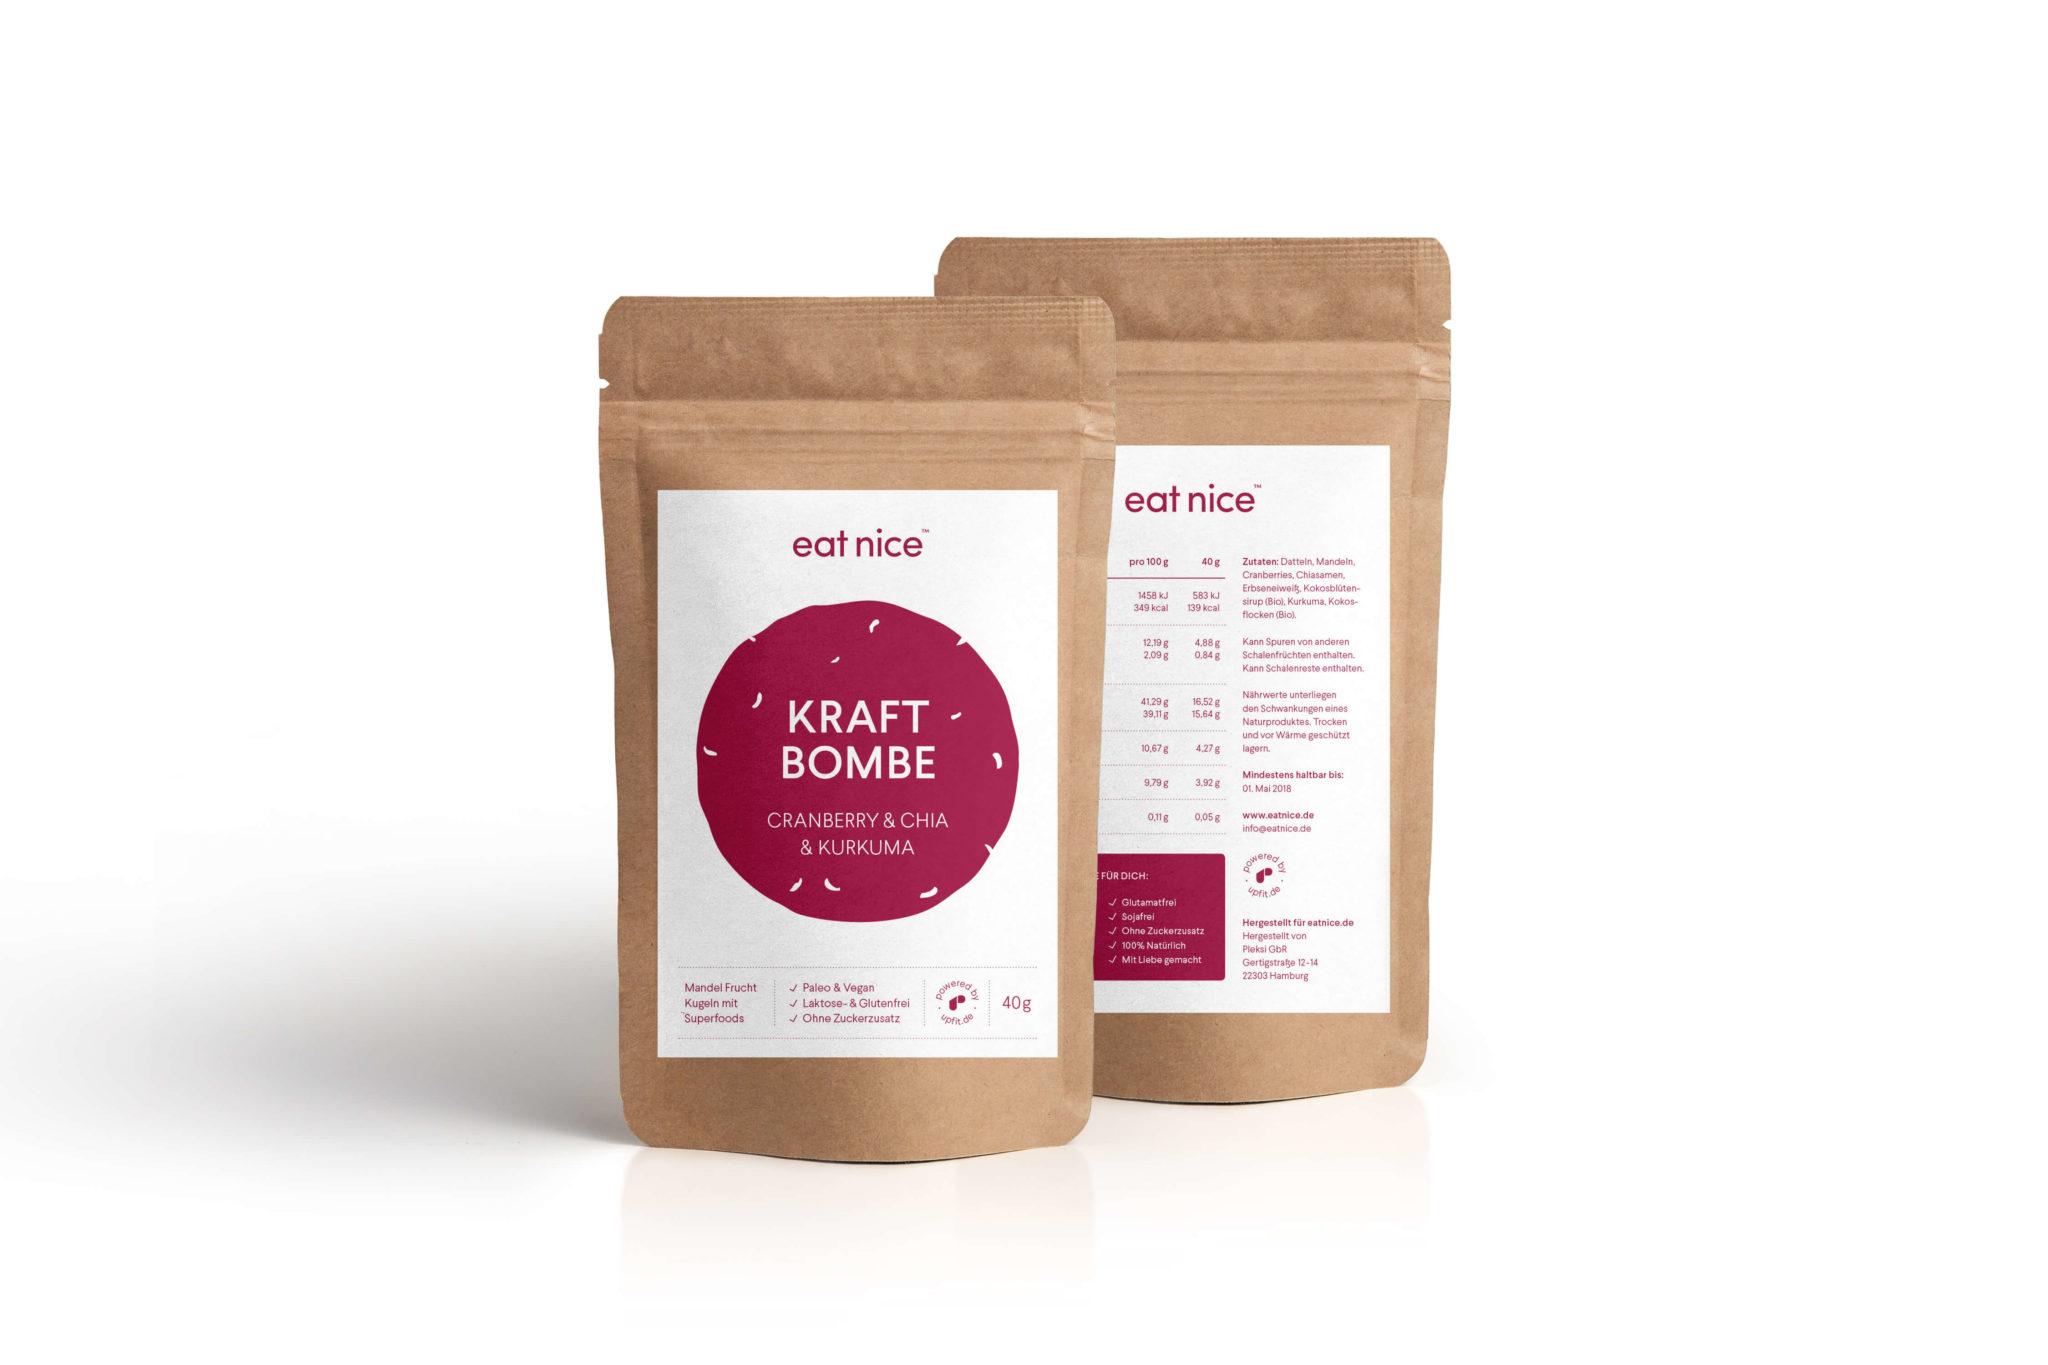 Eatnice Kraft Bombe